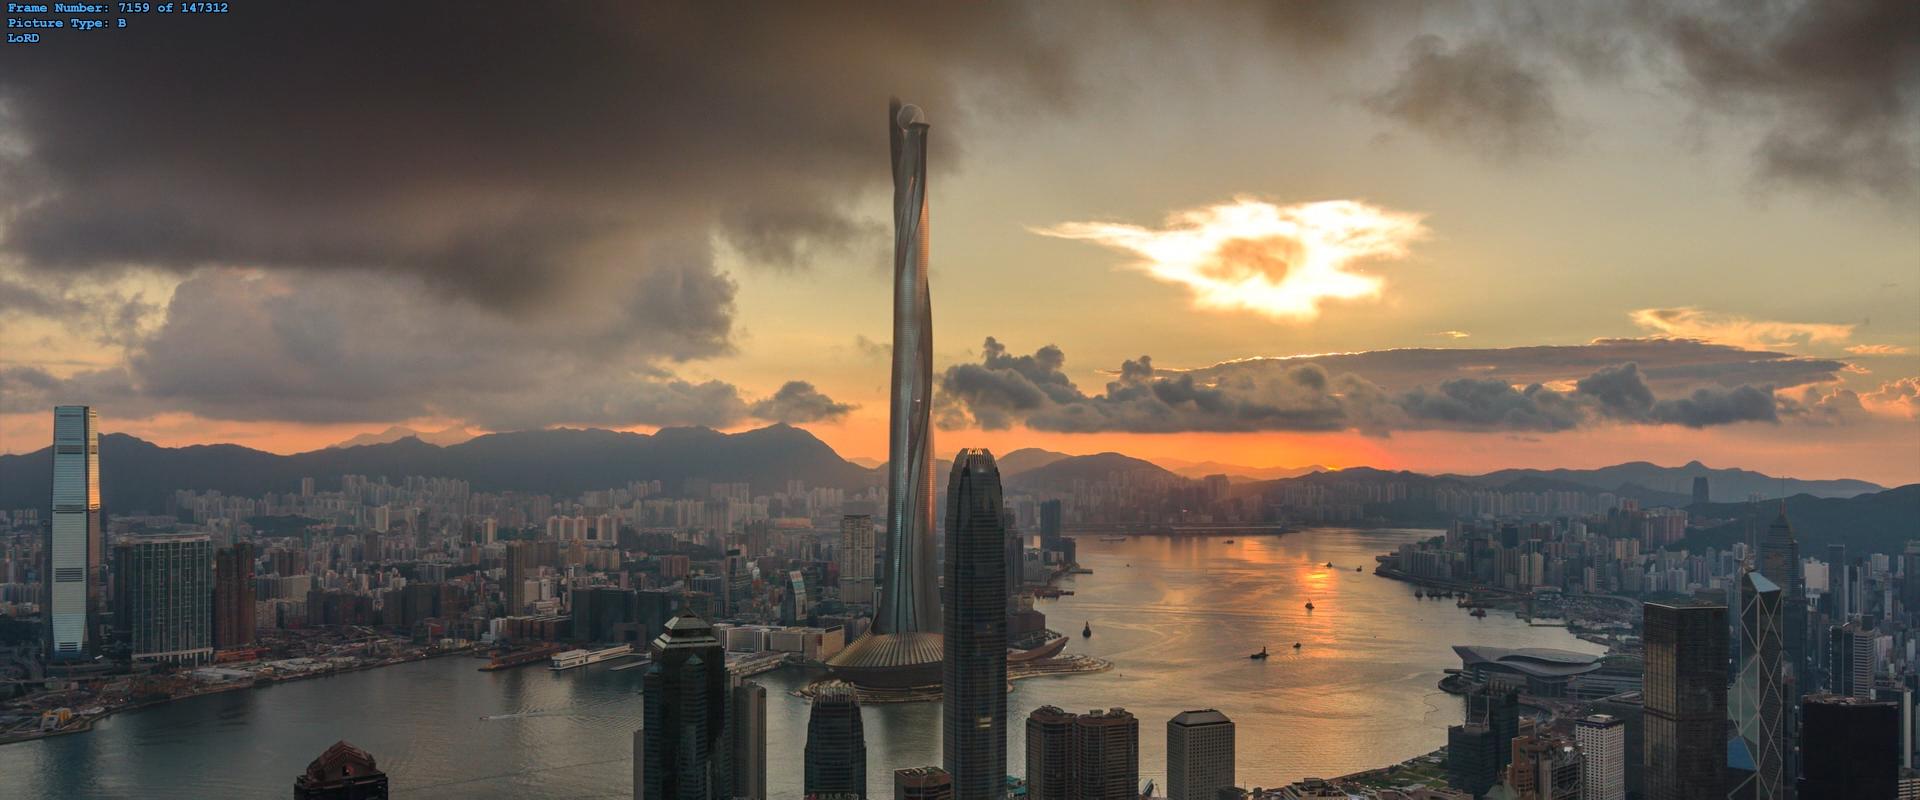 Gökdelen - Skyscraper | 2018 | BluRay | 720p - 1080p - 3D | x264 | DD-EX 5.1 | DUAL